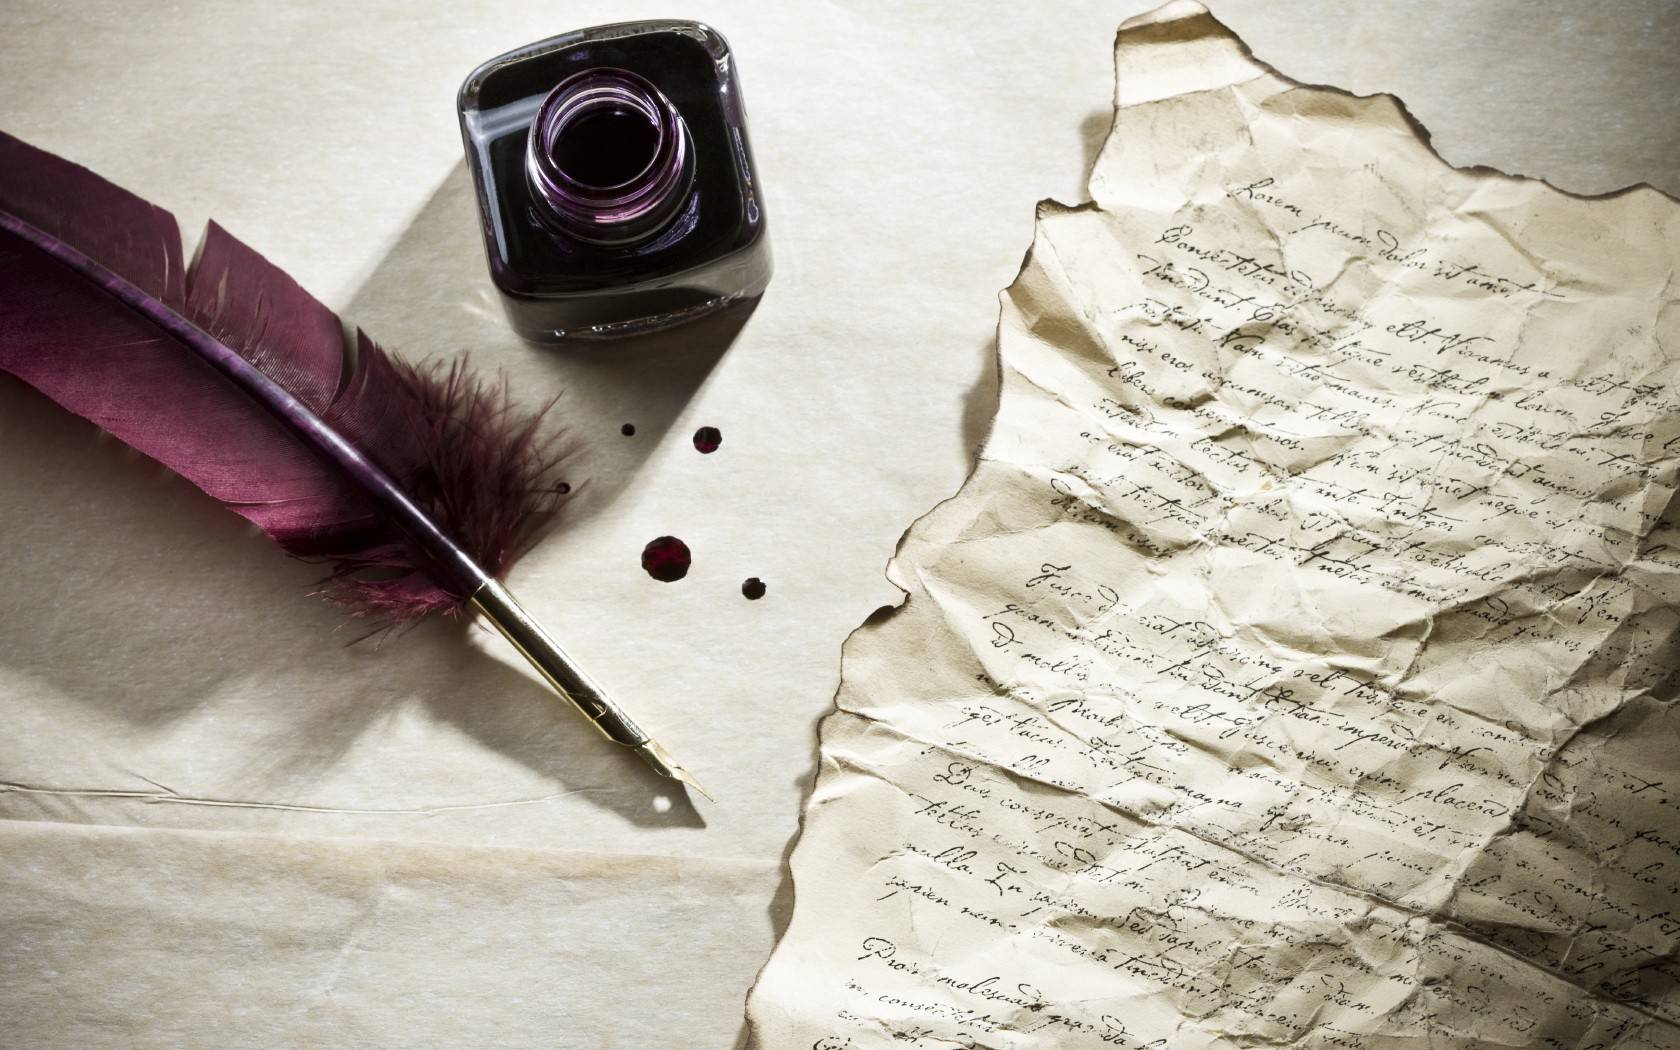 bkg pen paper dalsi